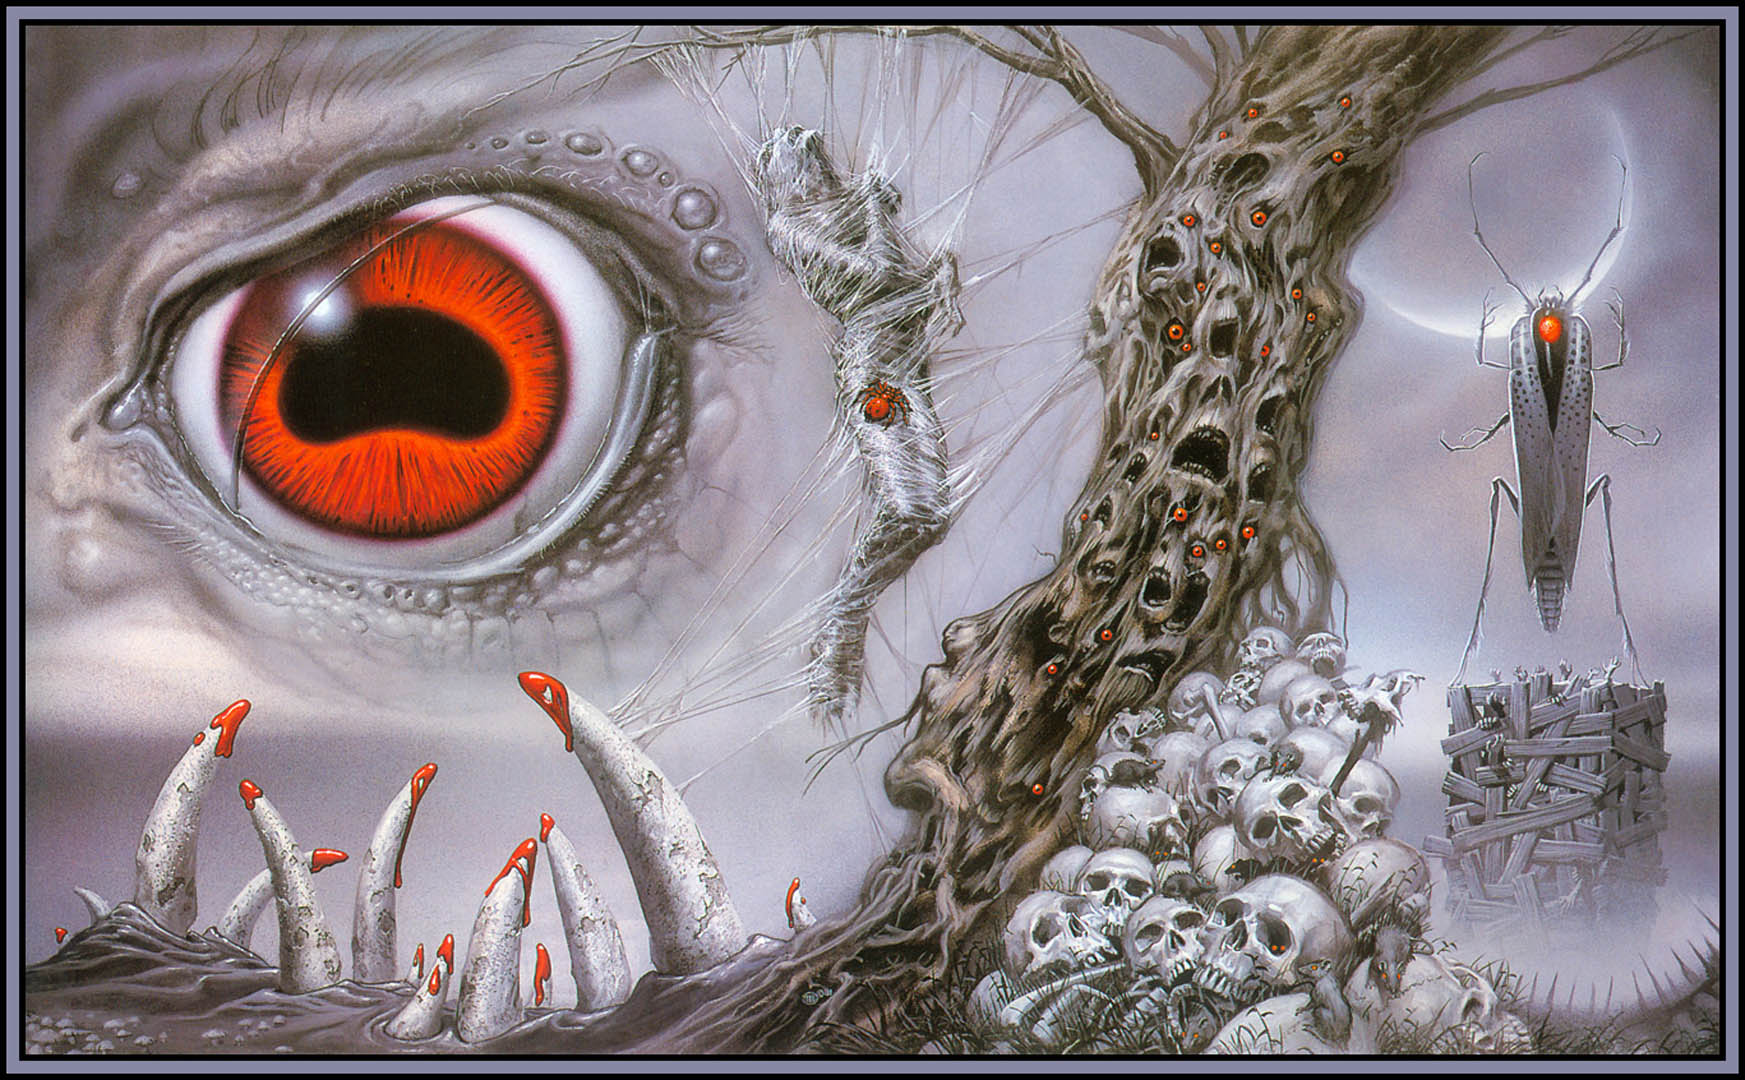 Hp Lovecraft Art Wallpapers: Michael Whelan Wallpaper Image